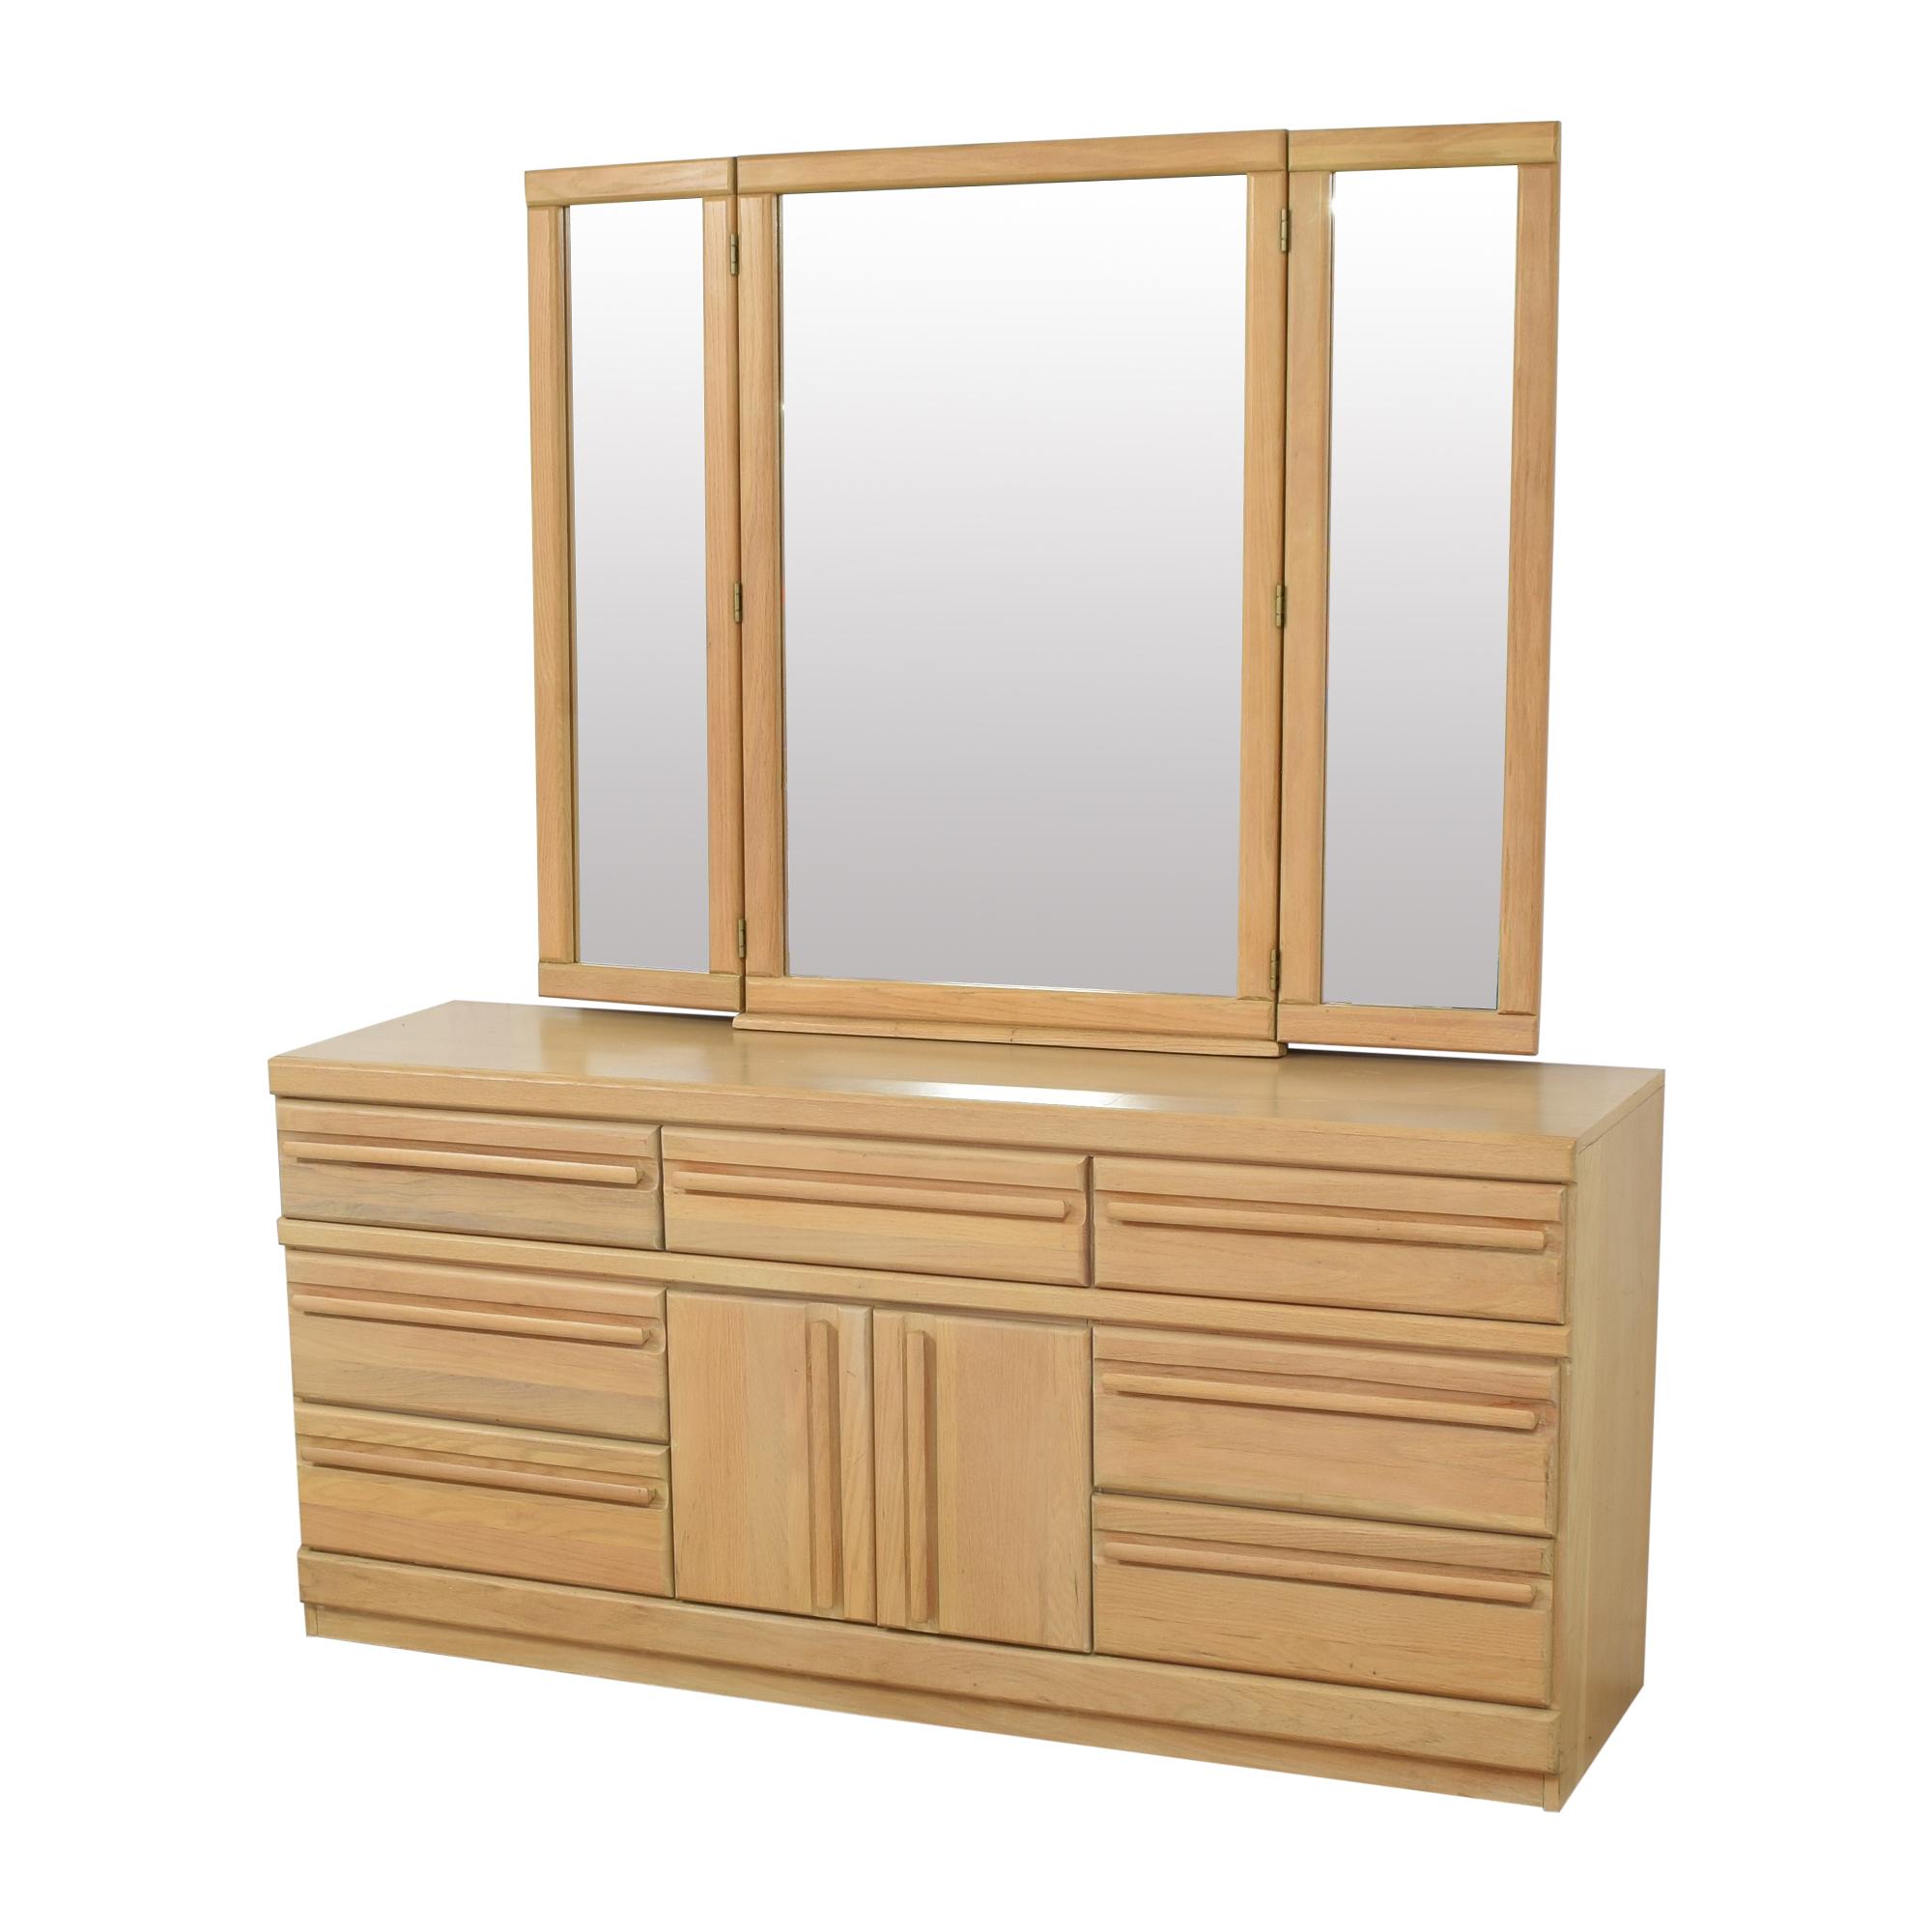 shop Broyhill Triple Dresser with Mirror Broyhill Furniture